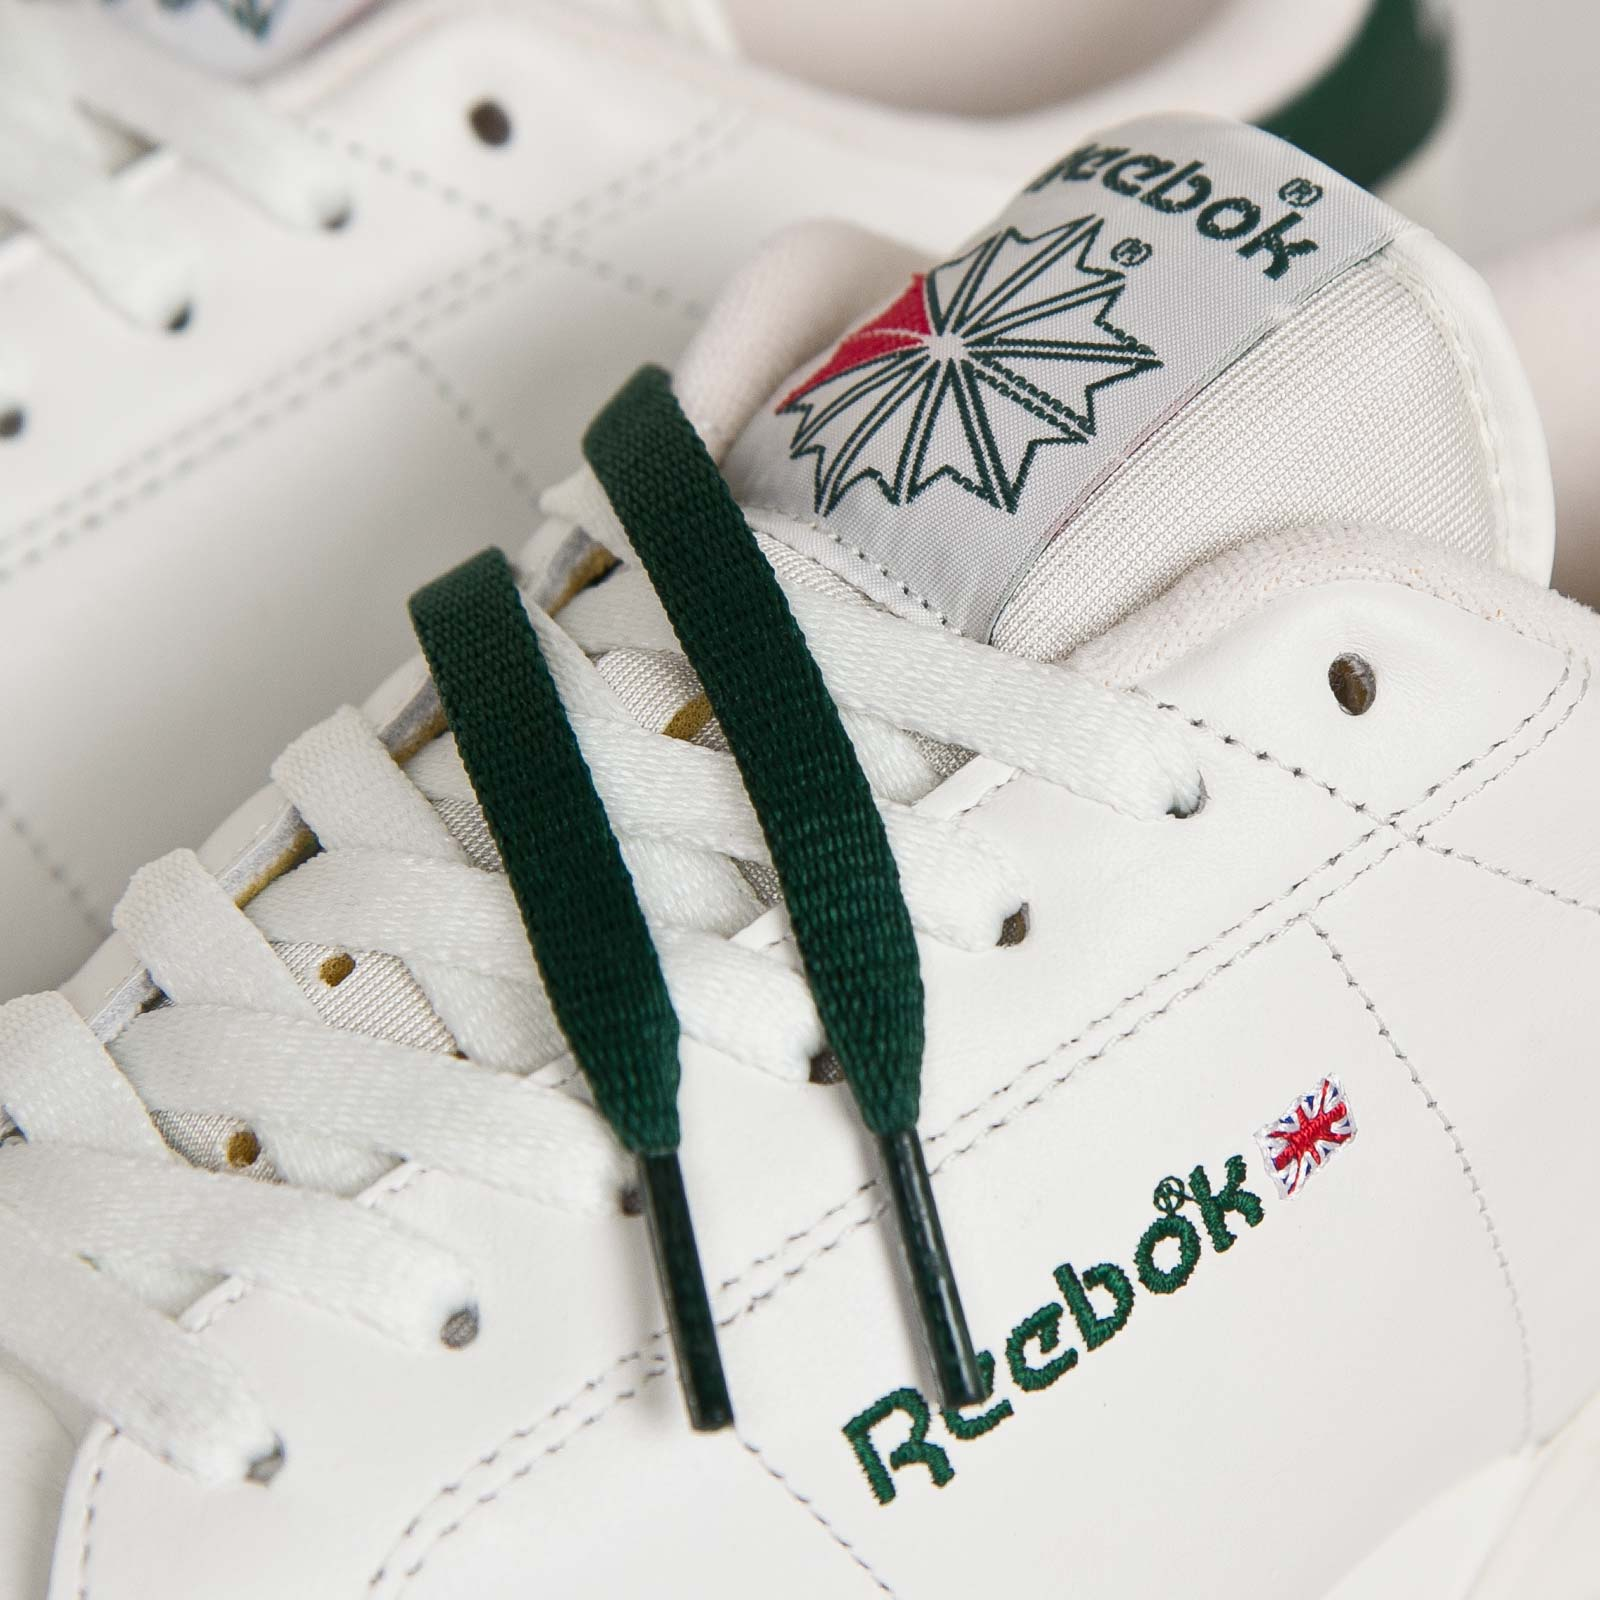 ab893e6632d Reebok NPC Vintage - M46564 - Sneakersnstuff